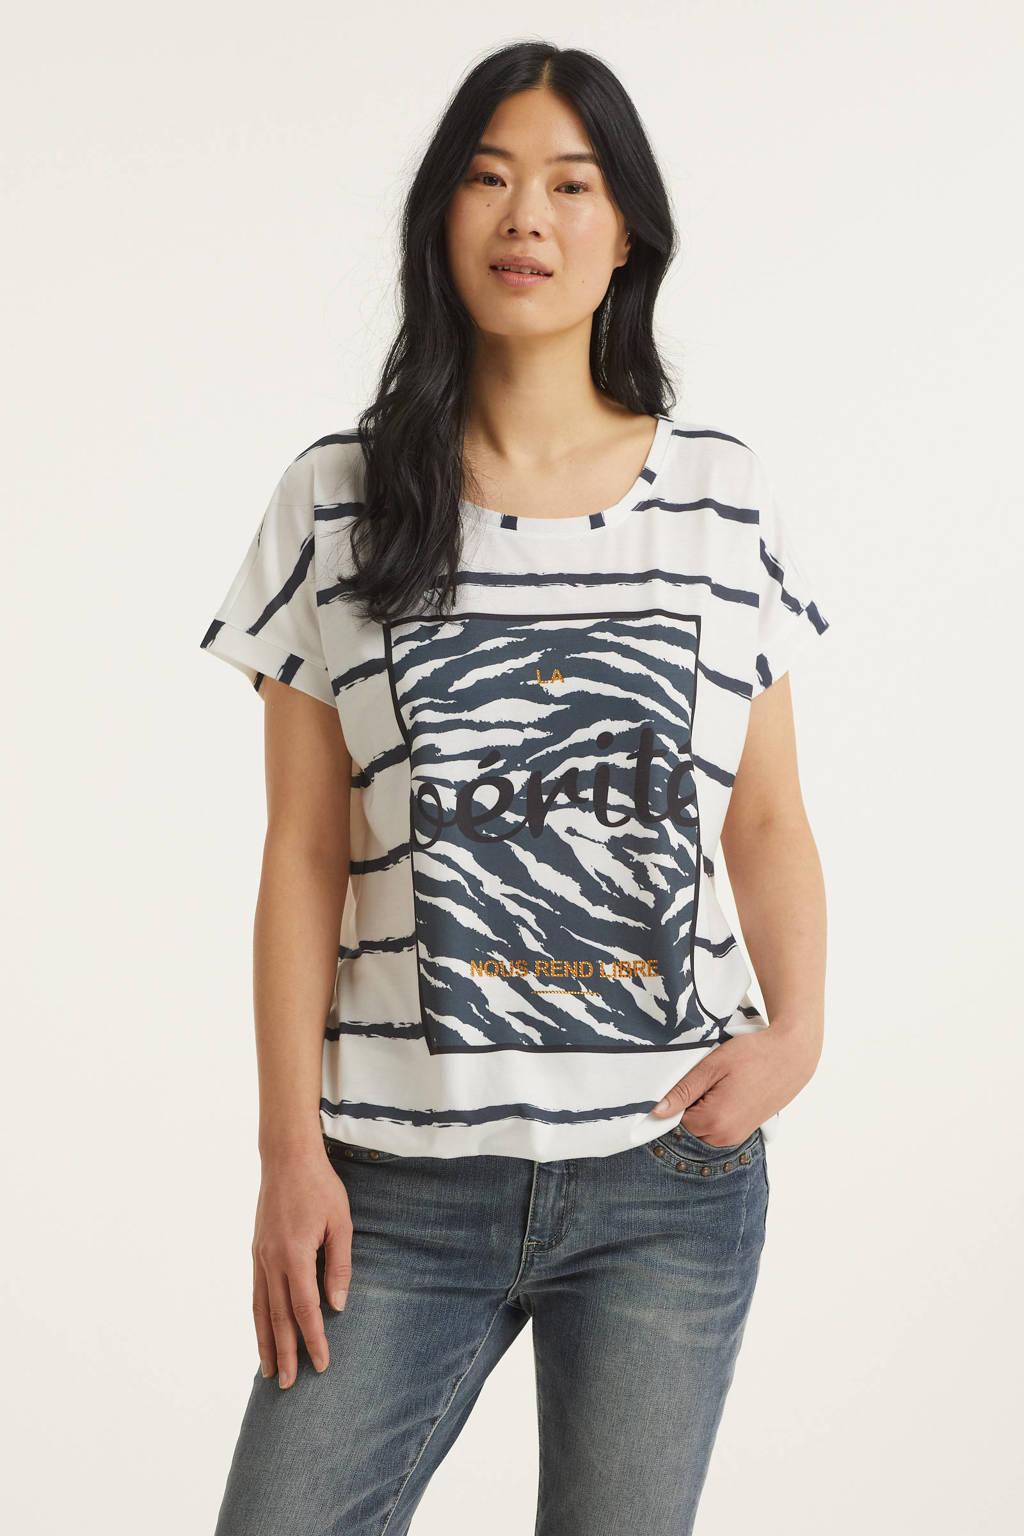 Geisha gestreept T-shirt wit/blauw, Wit/blauw